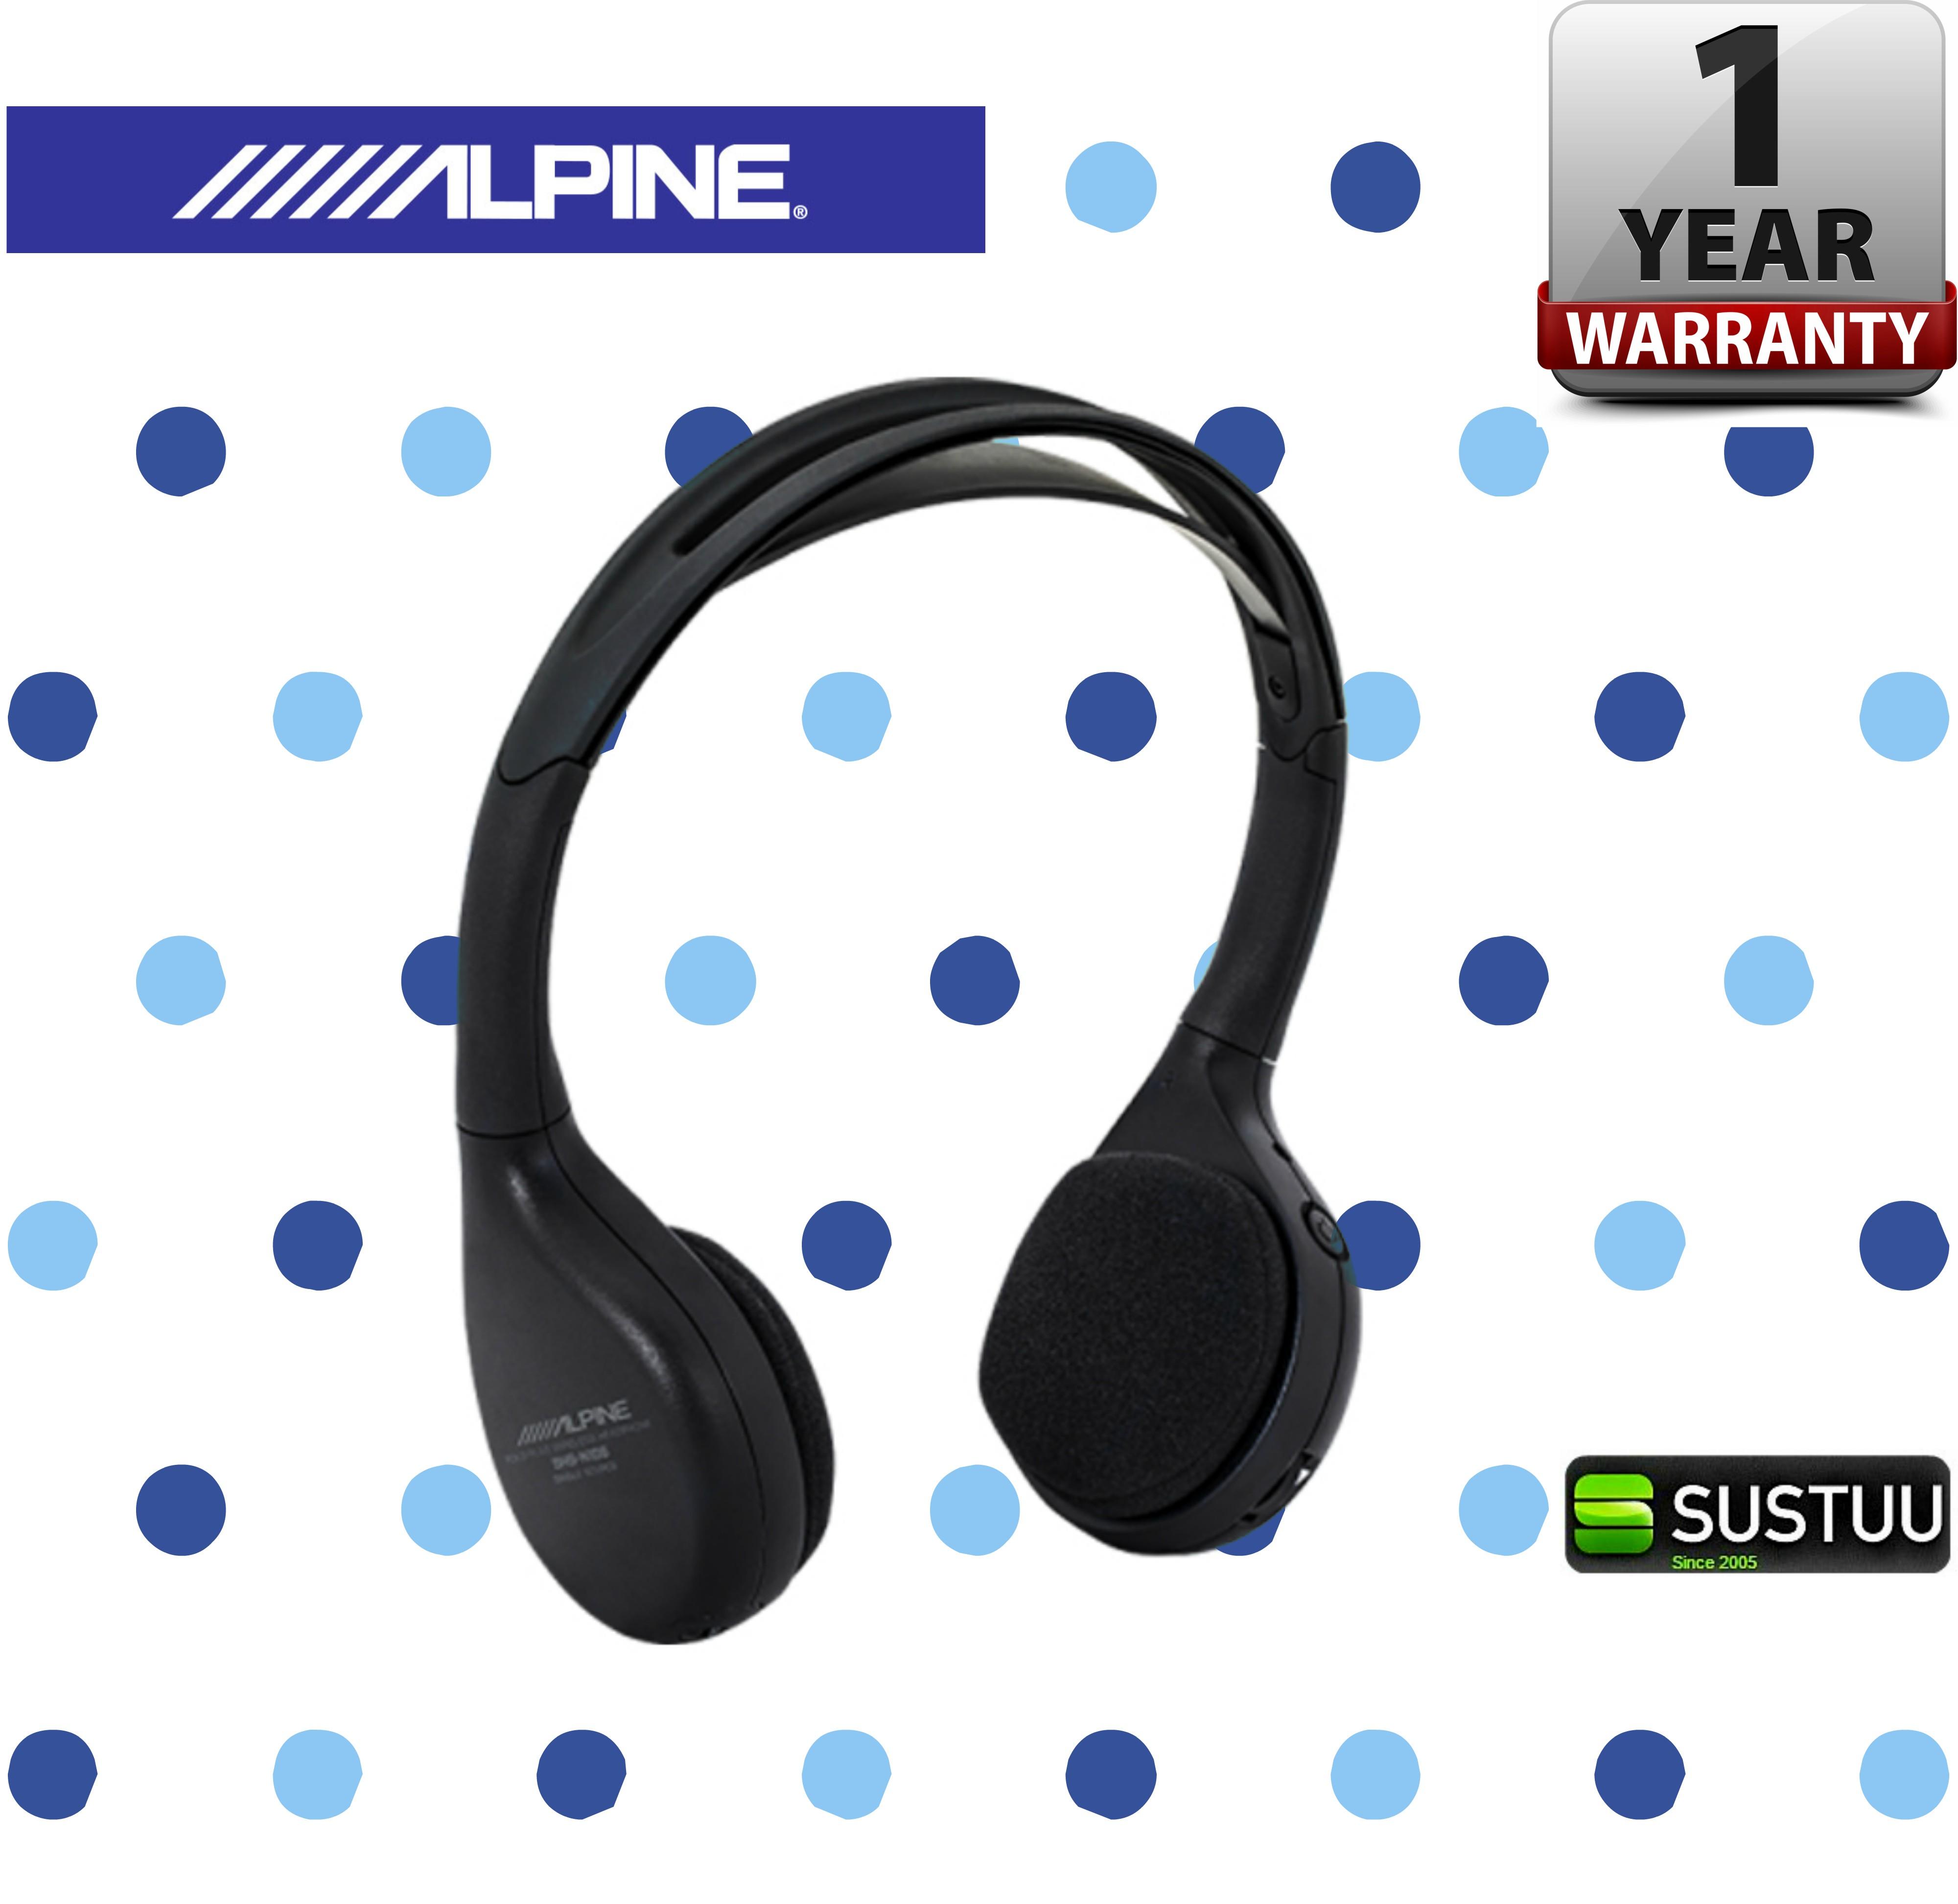 Alpine SHS D400 Wireless Infra Red Head Phones 90db SNR Flat Folding Technology